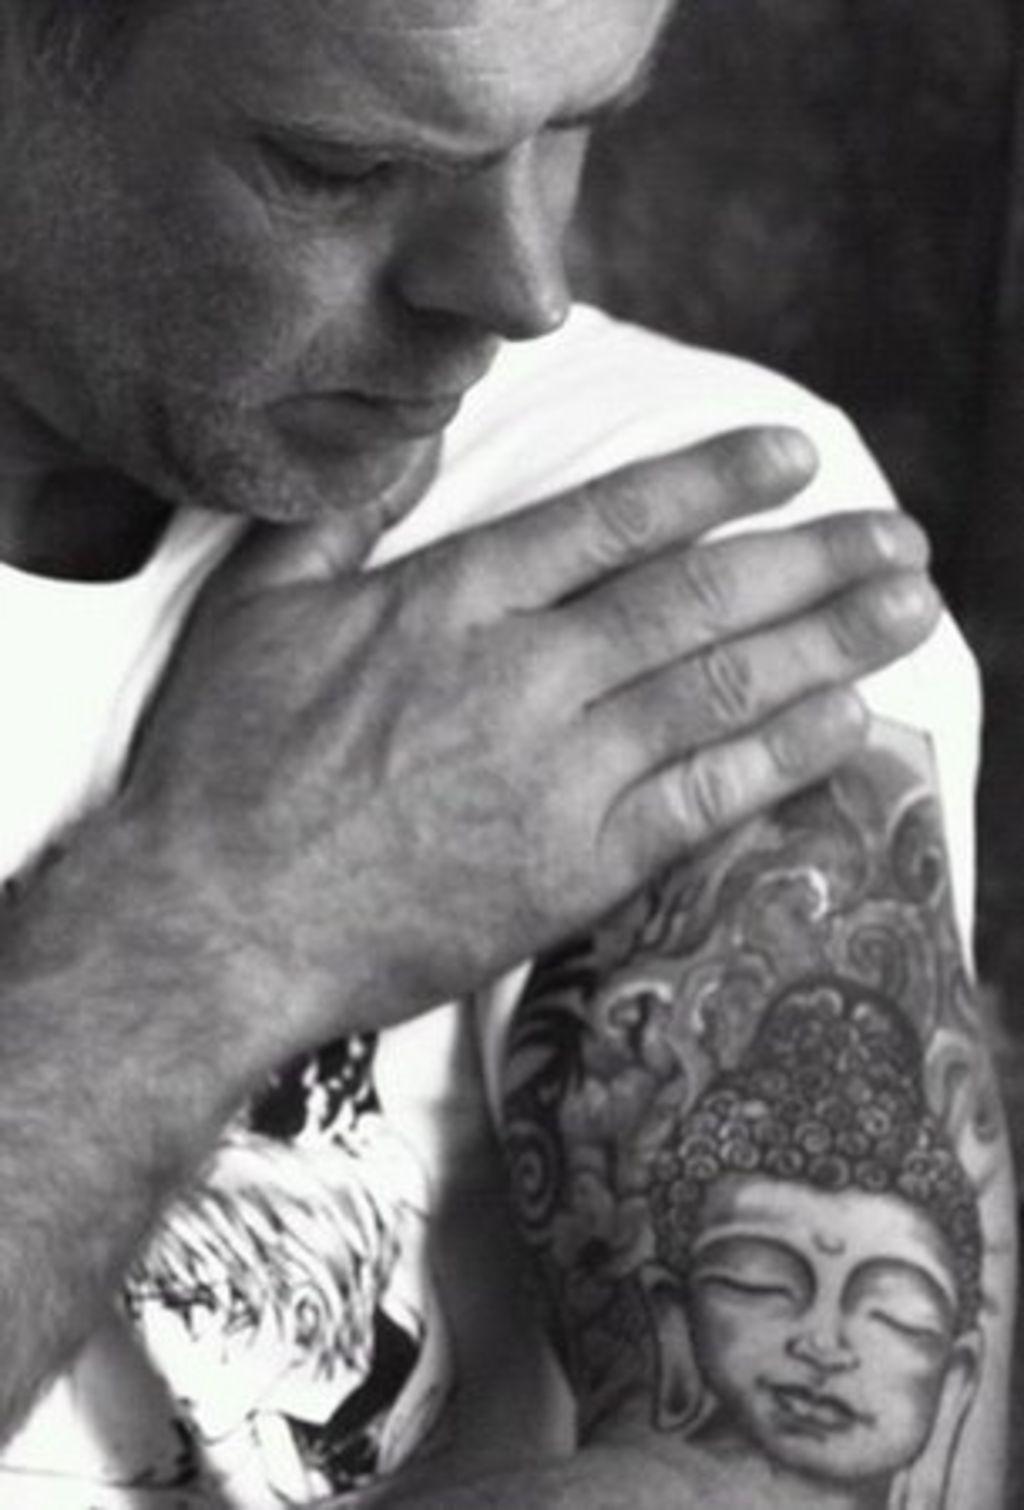 Briton Denies Buddha Tattoo Was Disrespectful Bbc News